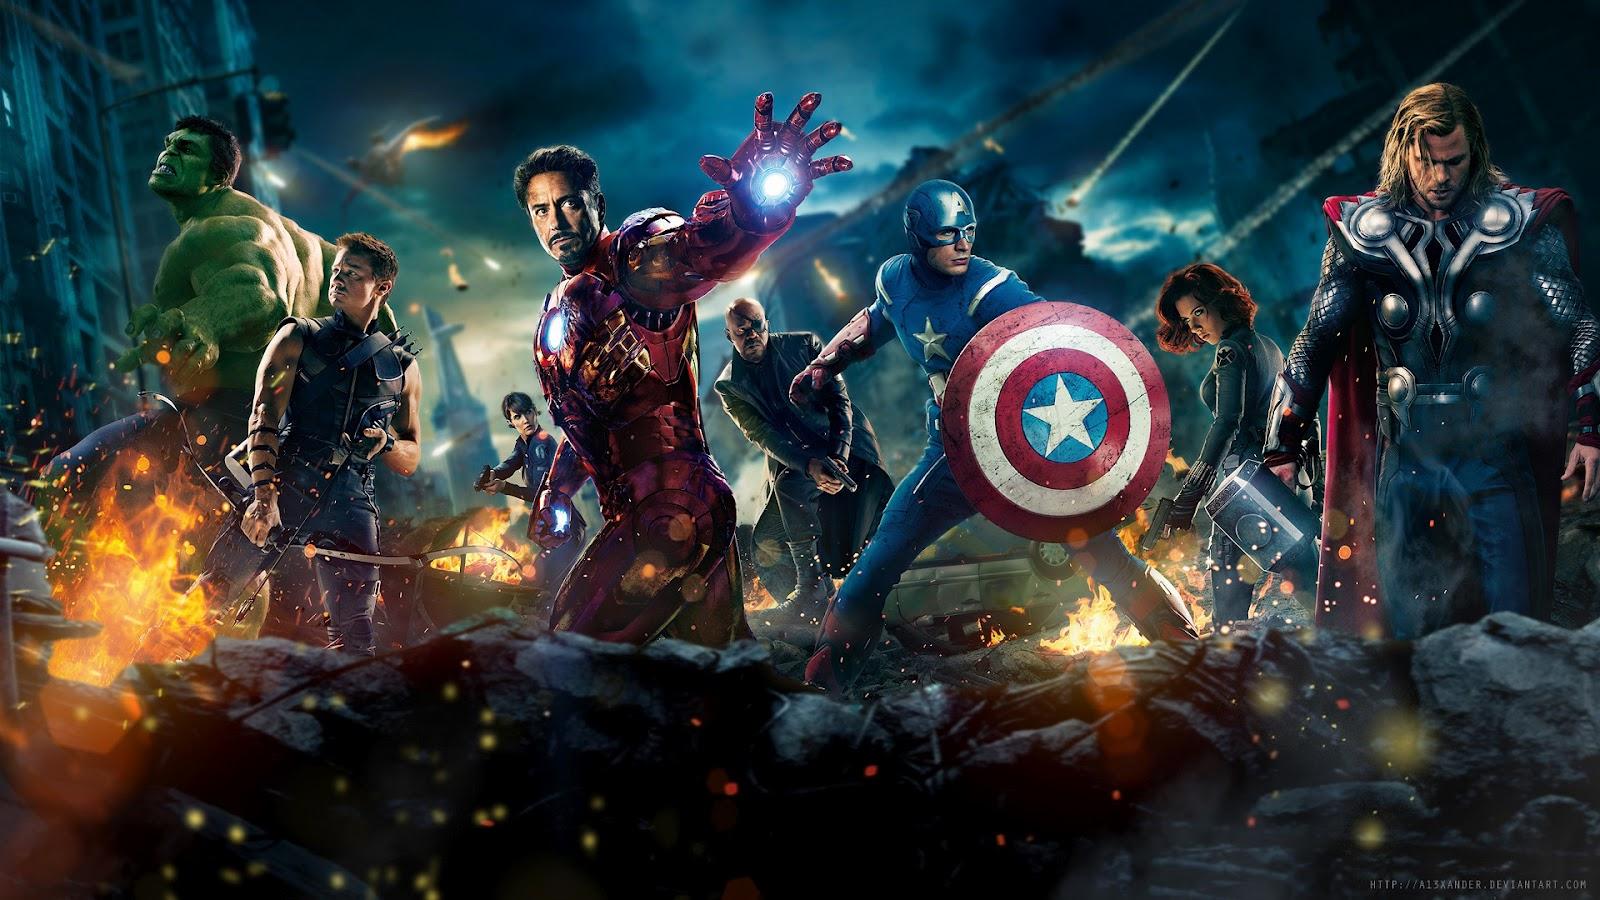 Hd Wallon 1920x1080 Hd Wallpaper Avengers